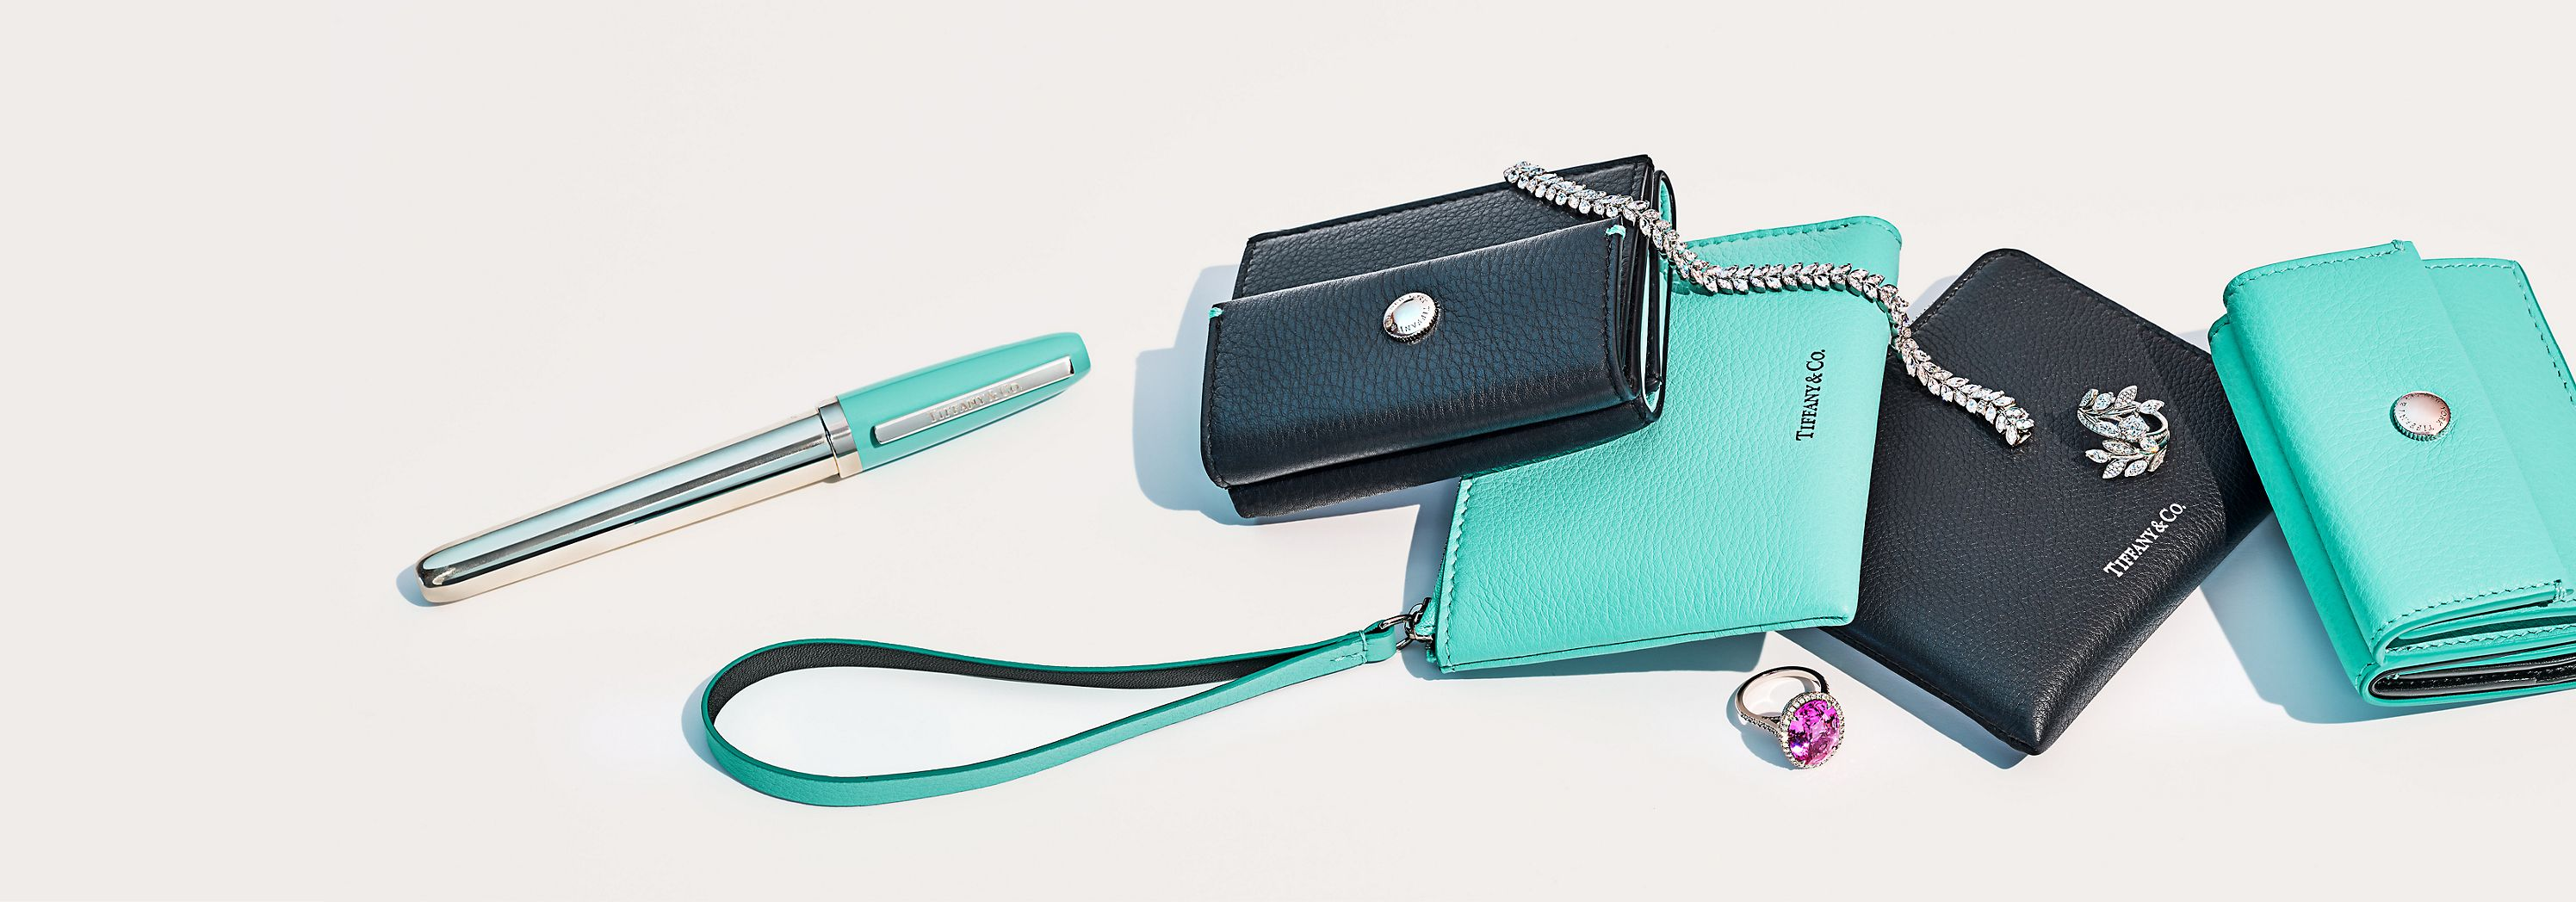 Shop Tiffany & Co. Luxury Leather Goods